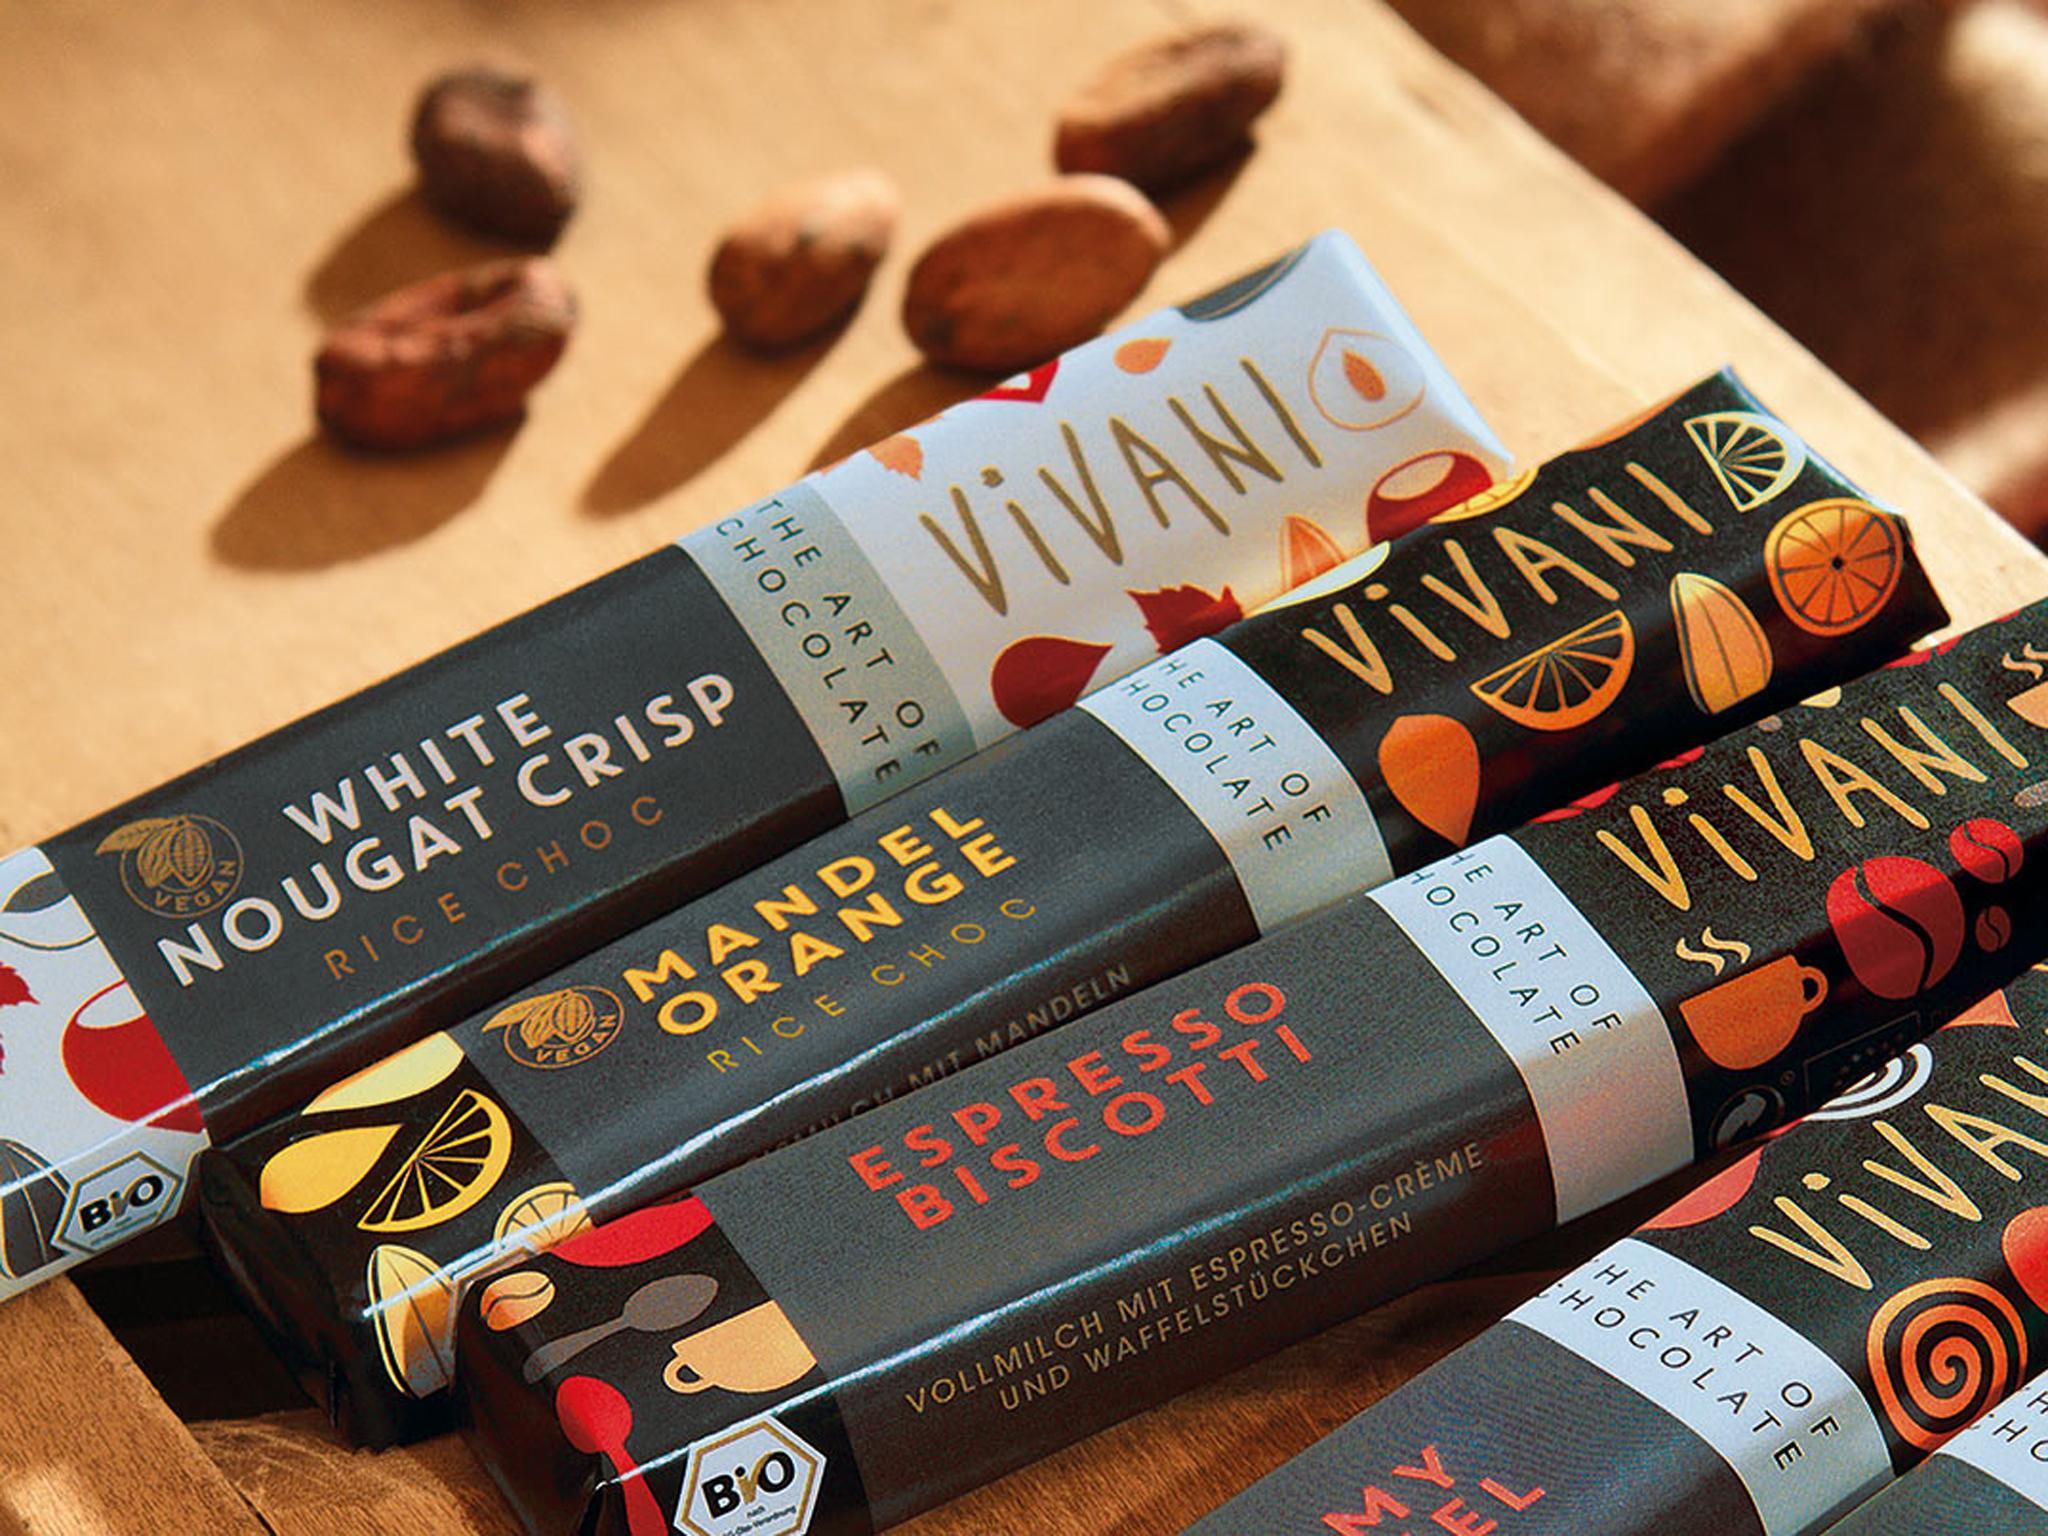 10 Best Vegan Chocolate Bars The Independent